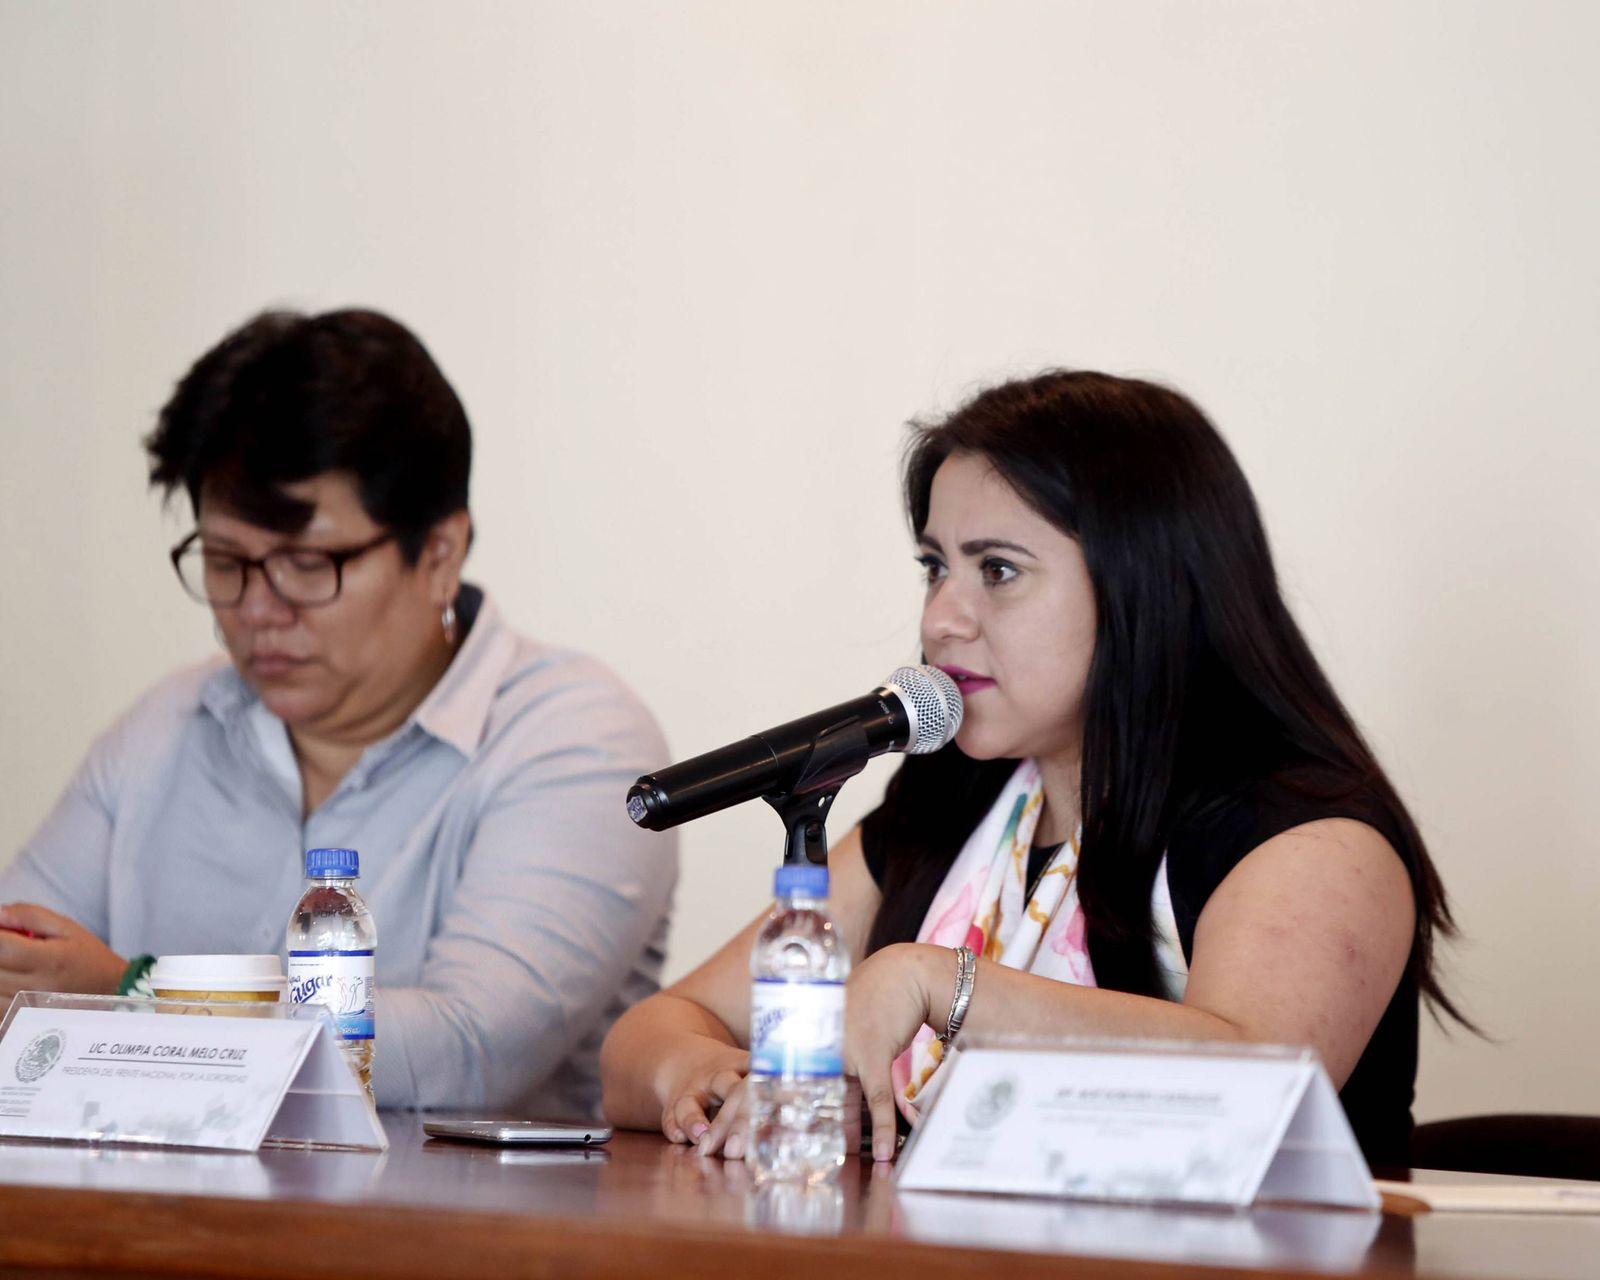 February 18 2019 EUM20190218NAC30 JPG OAXACA Oax Crime Delitos Oaxaca 18 de febrero 2019 E